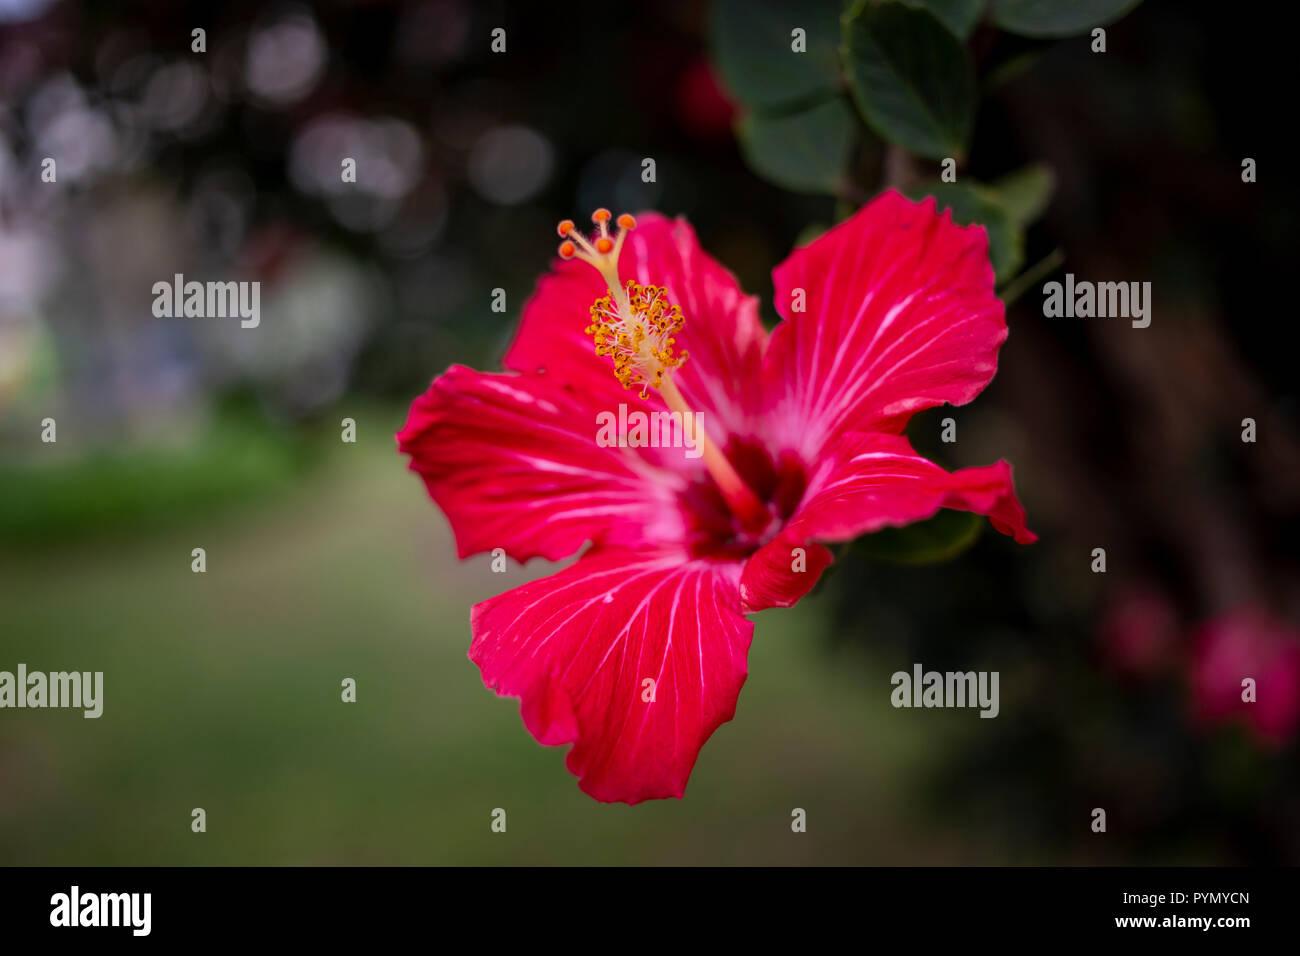 Roter Hibiskus Nahaufnahme - Stock Image